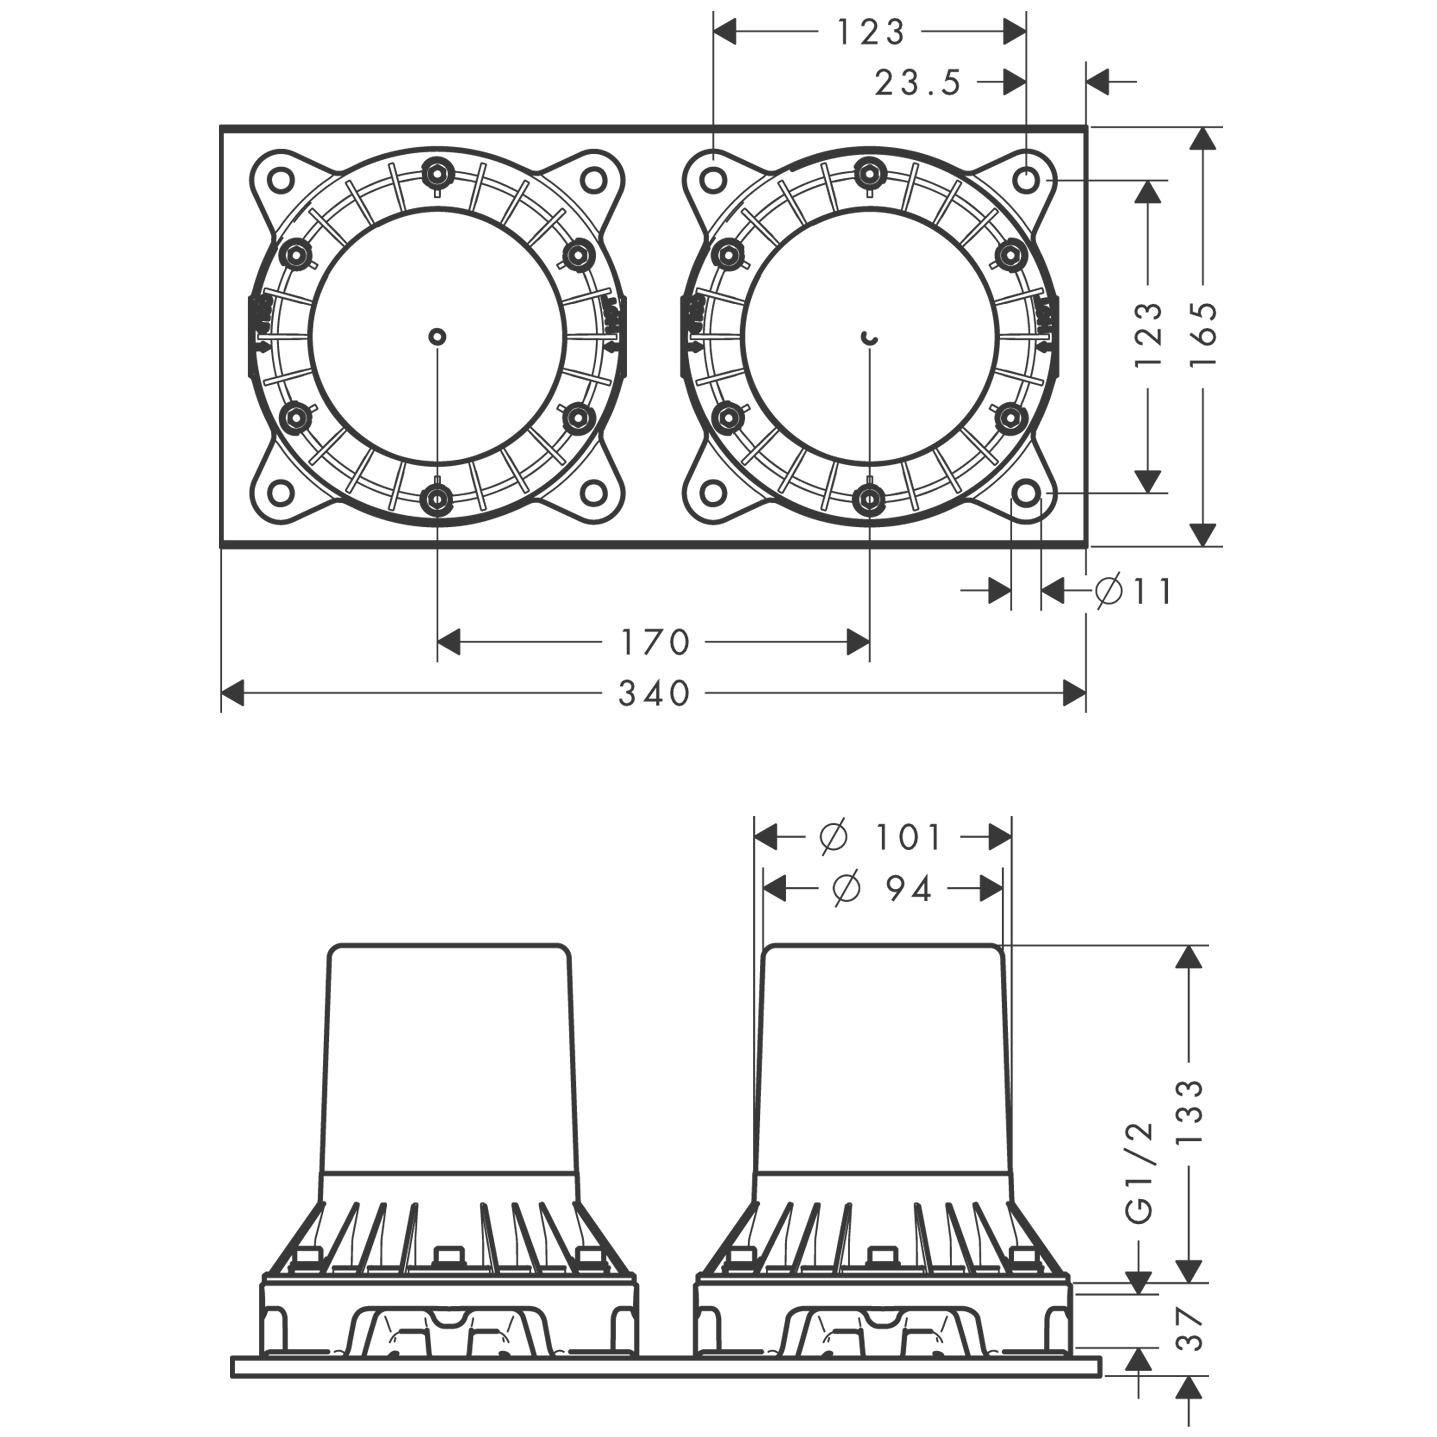 16549180 AXOR Montreux Basic set for 2 handle floor standing bath mixer